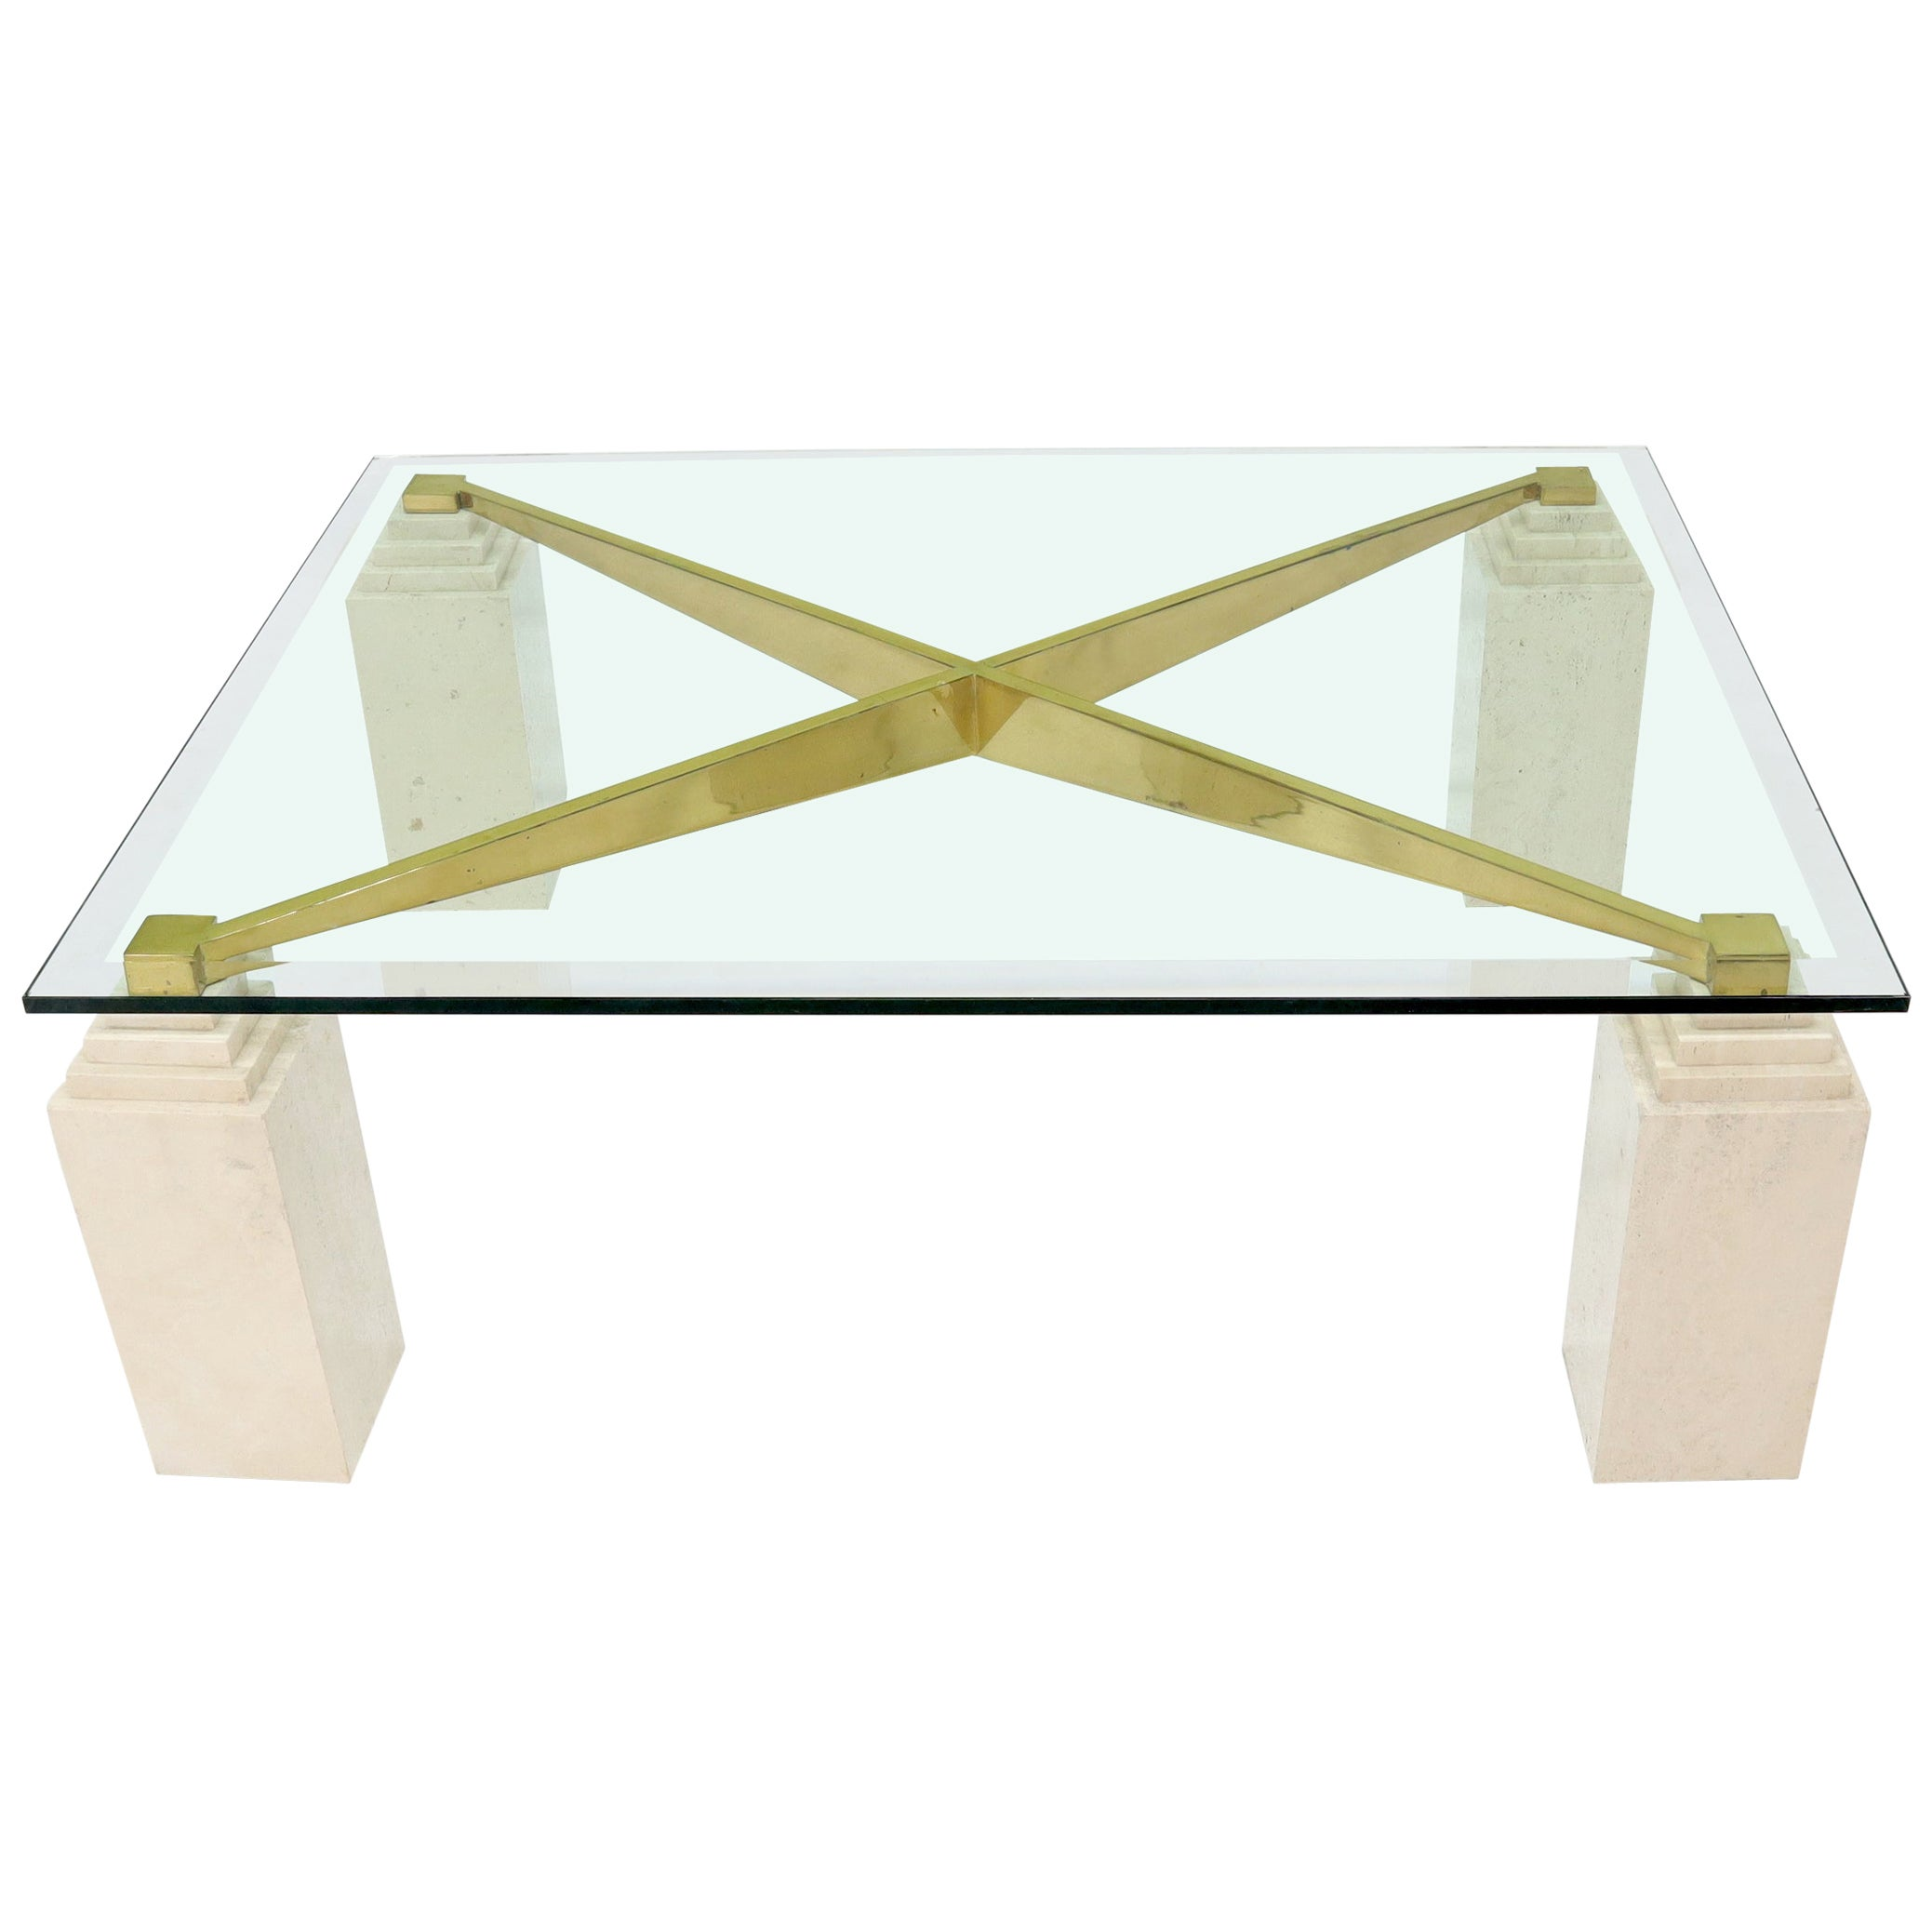 Square Travertine Legs Brass X Shape Base Glass Top Coffee Table